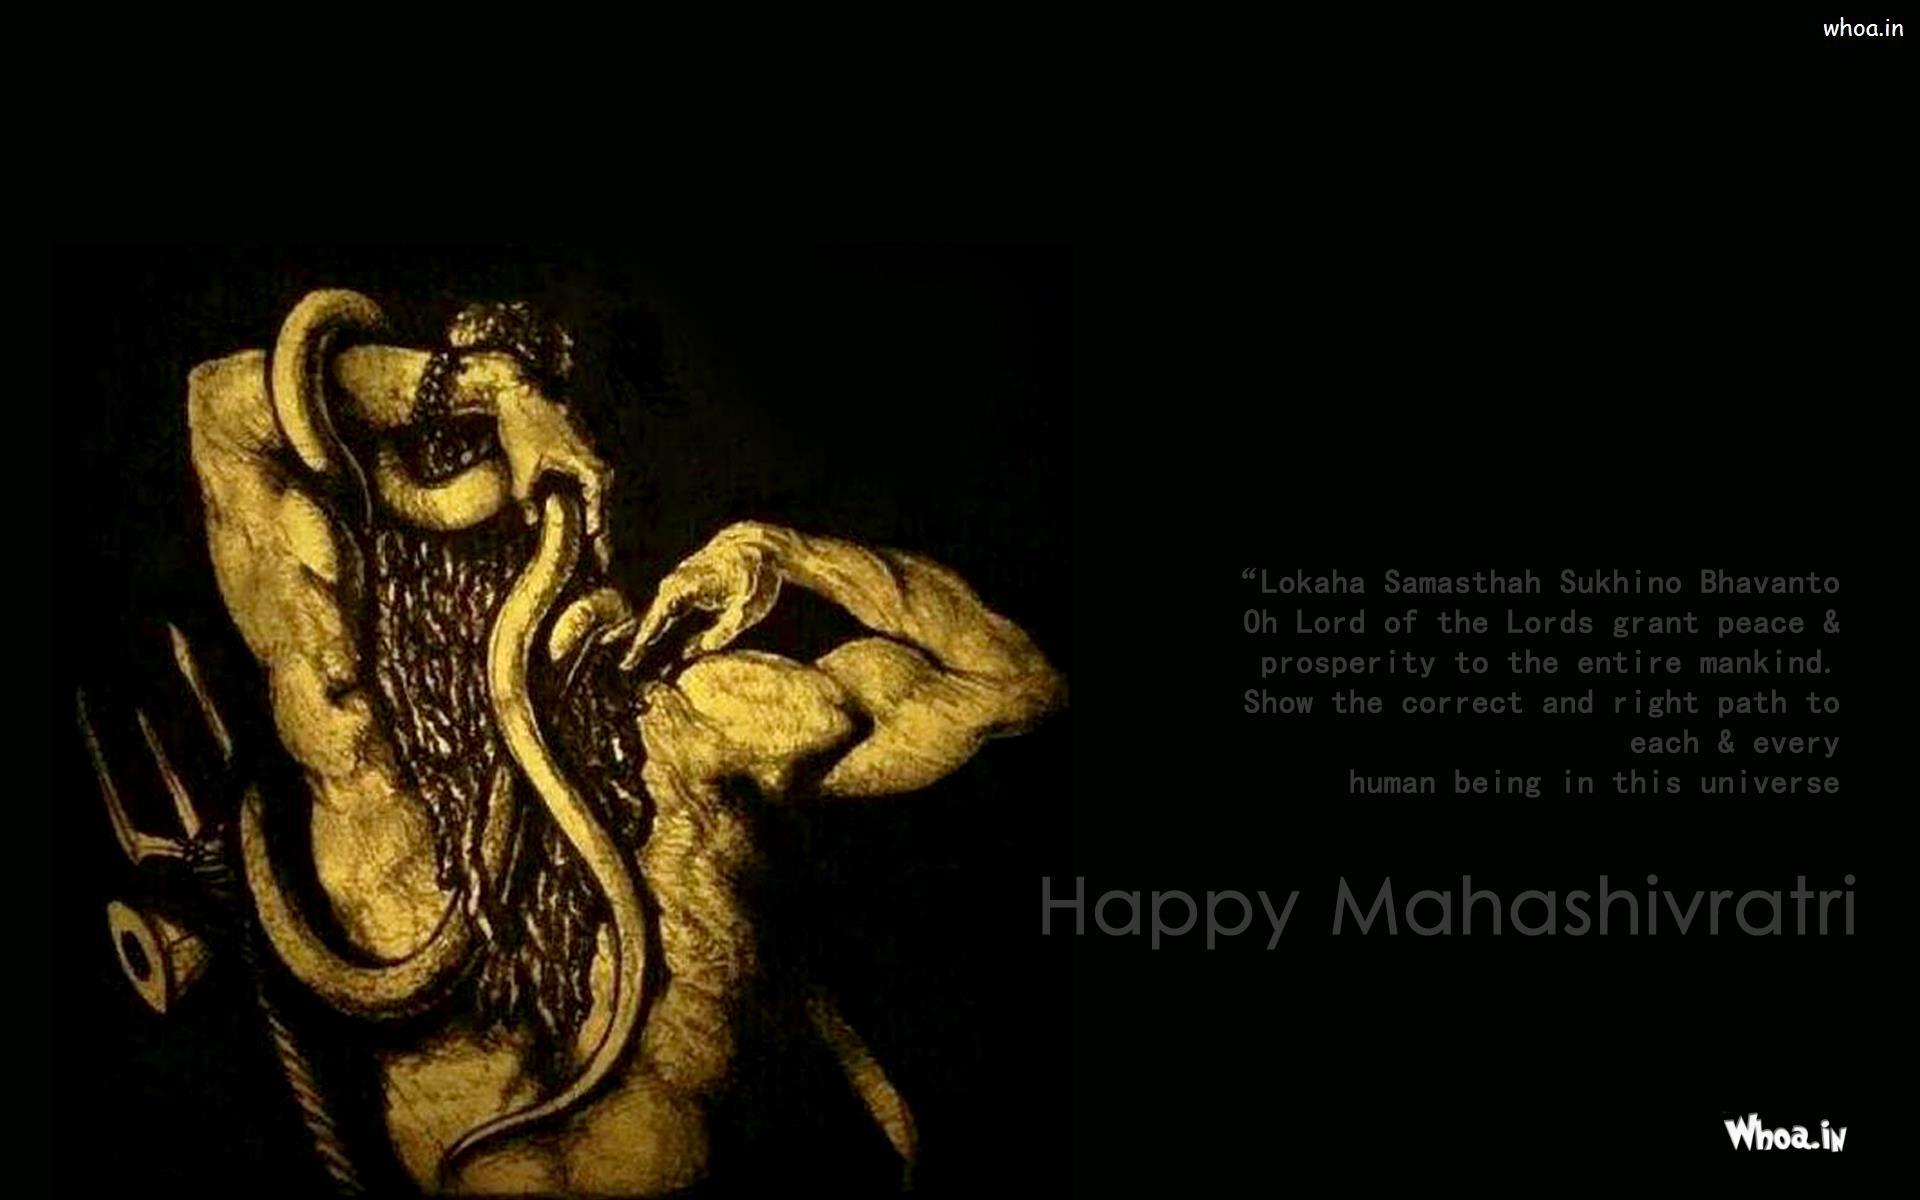 Hd wallpaper shiva - Happy Mahashivratri Greeting Wallpapers And Images